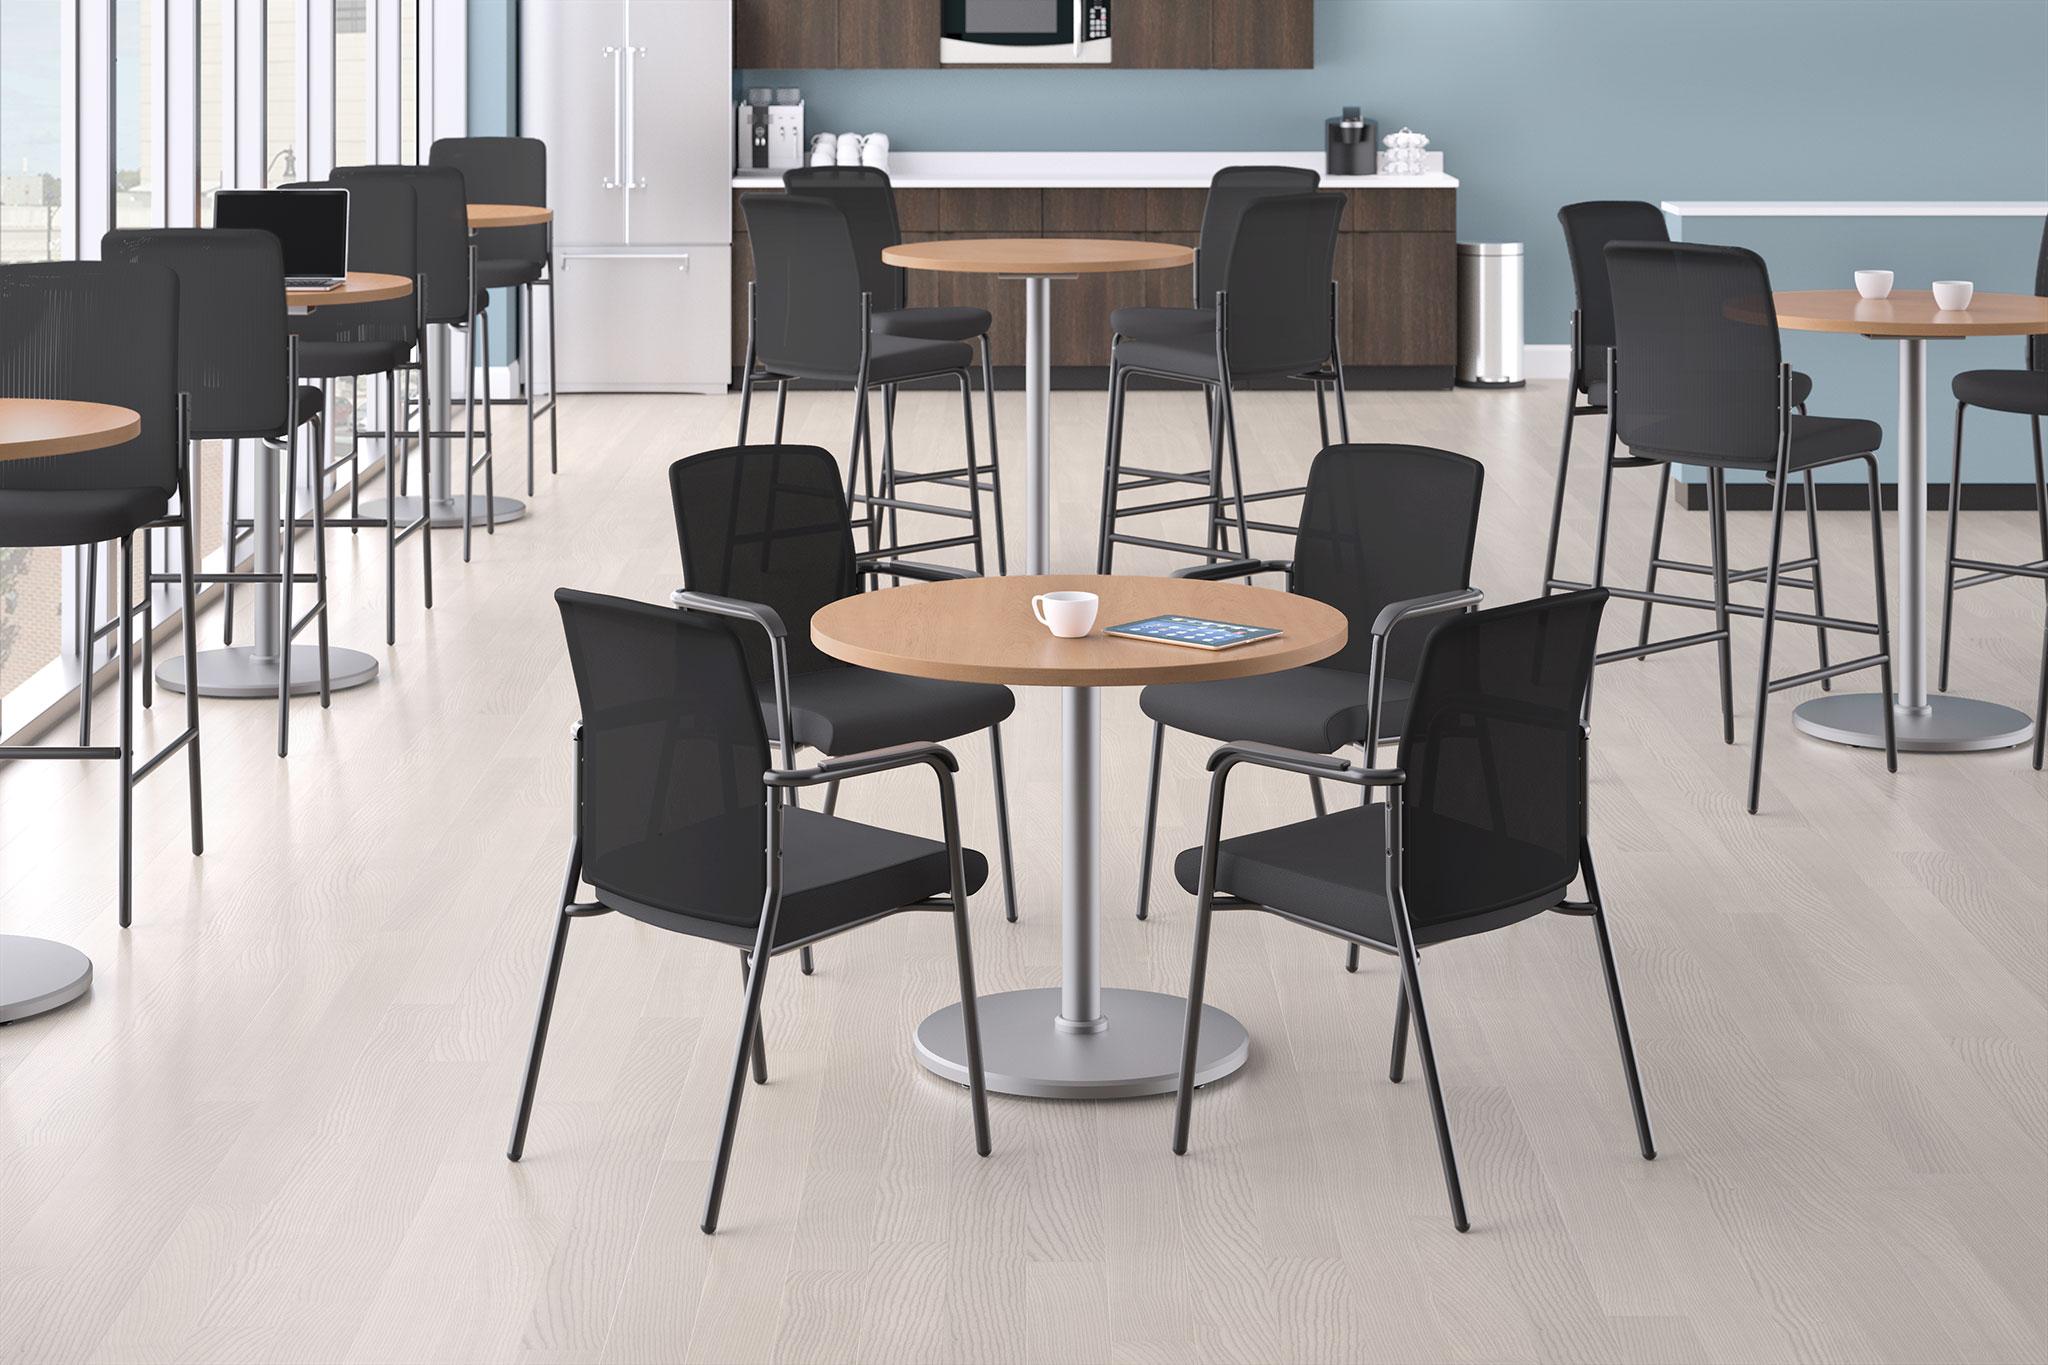 Office Cafe Furniture